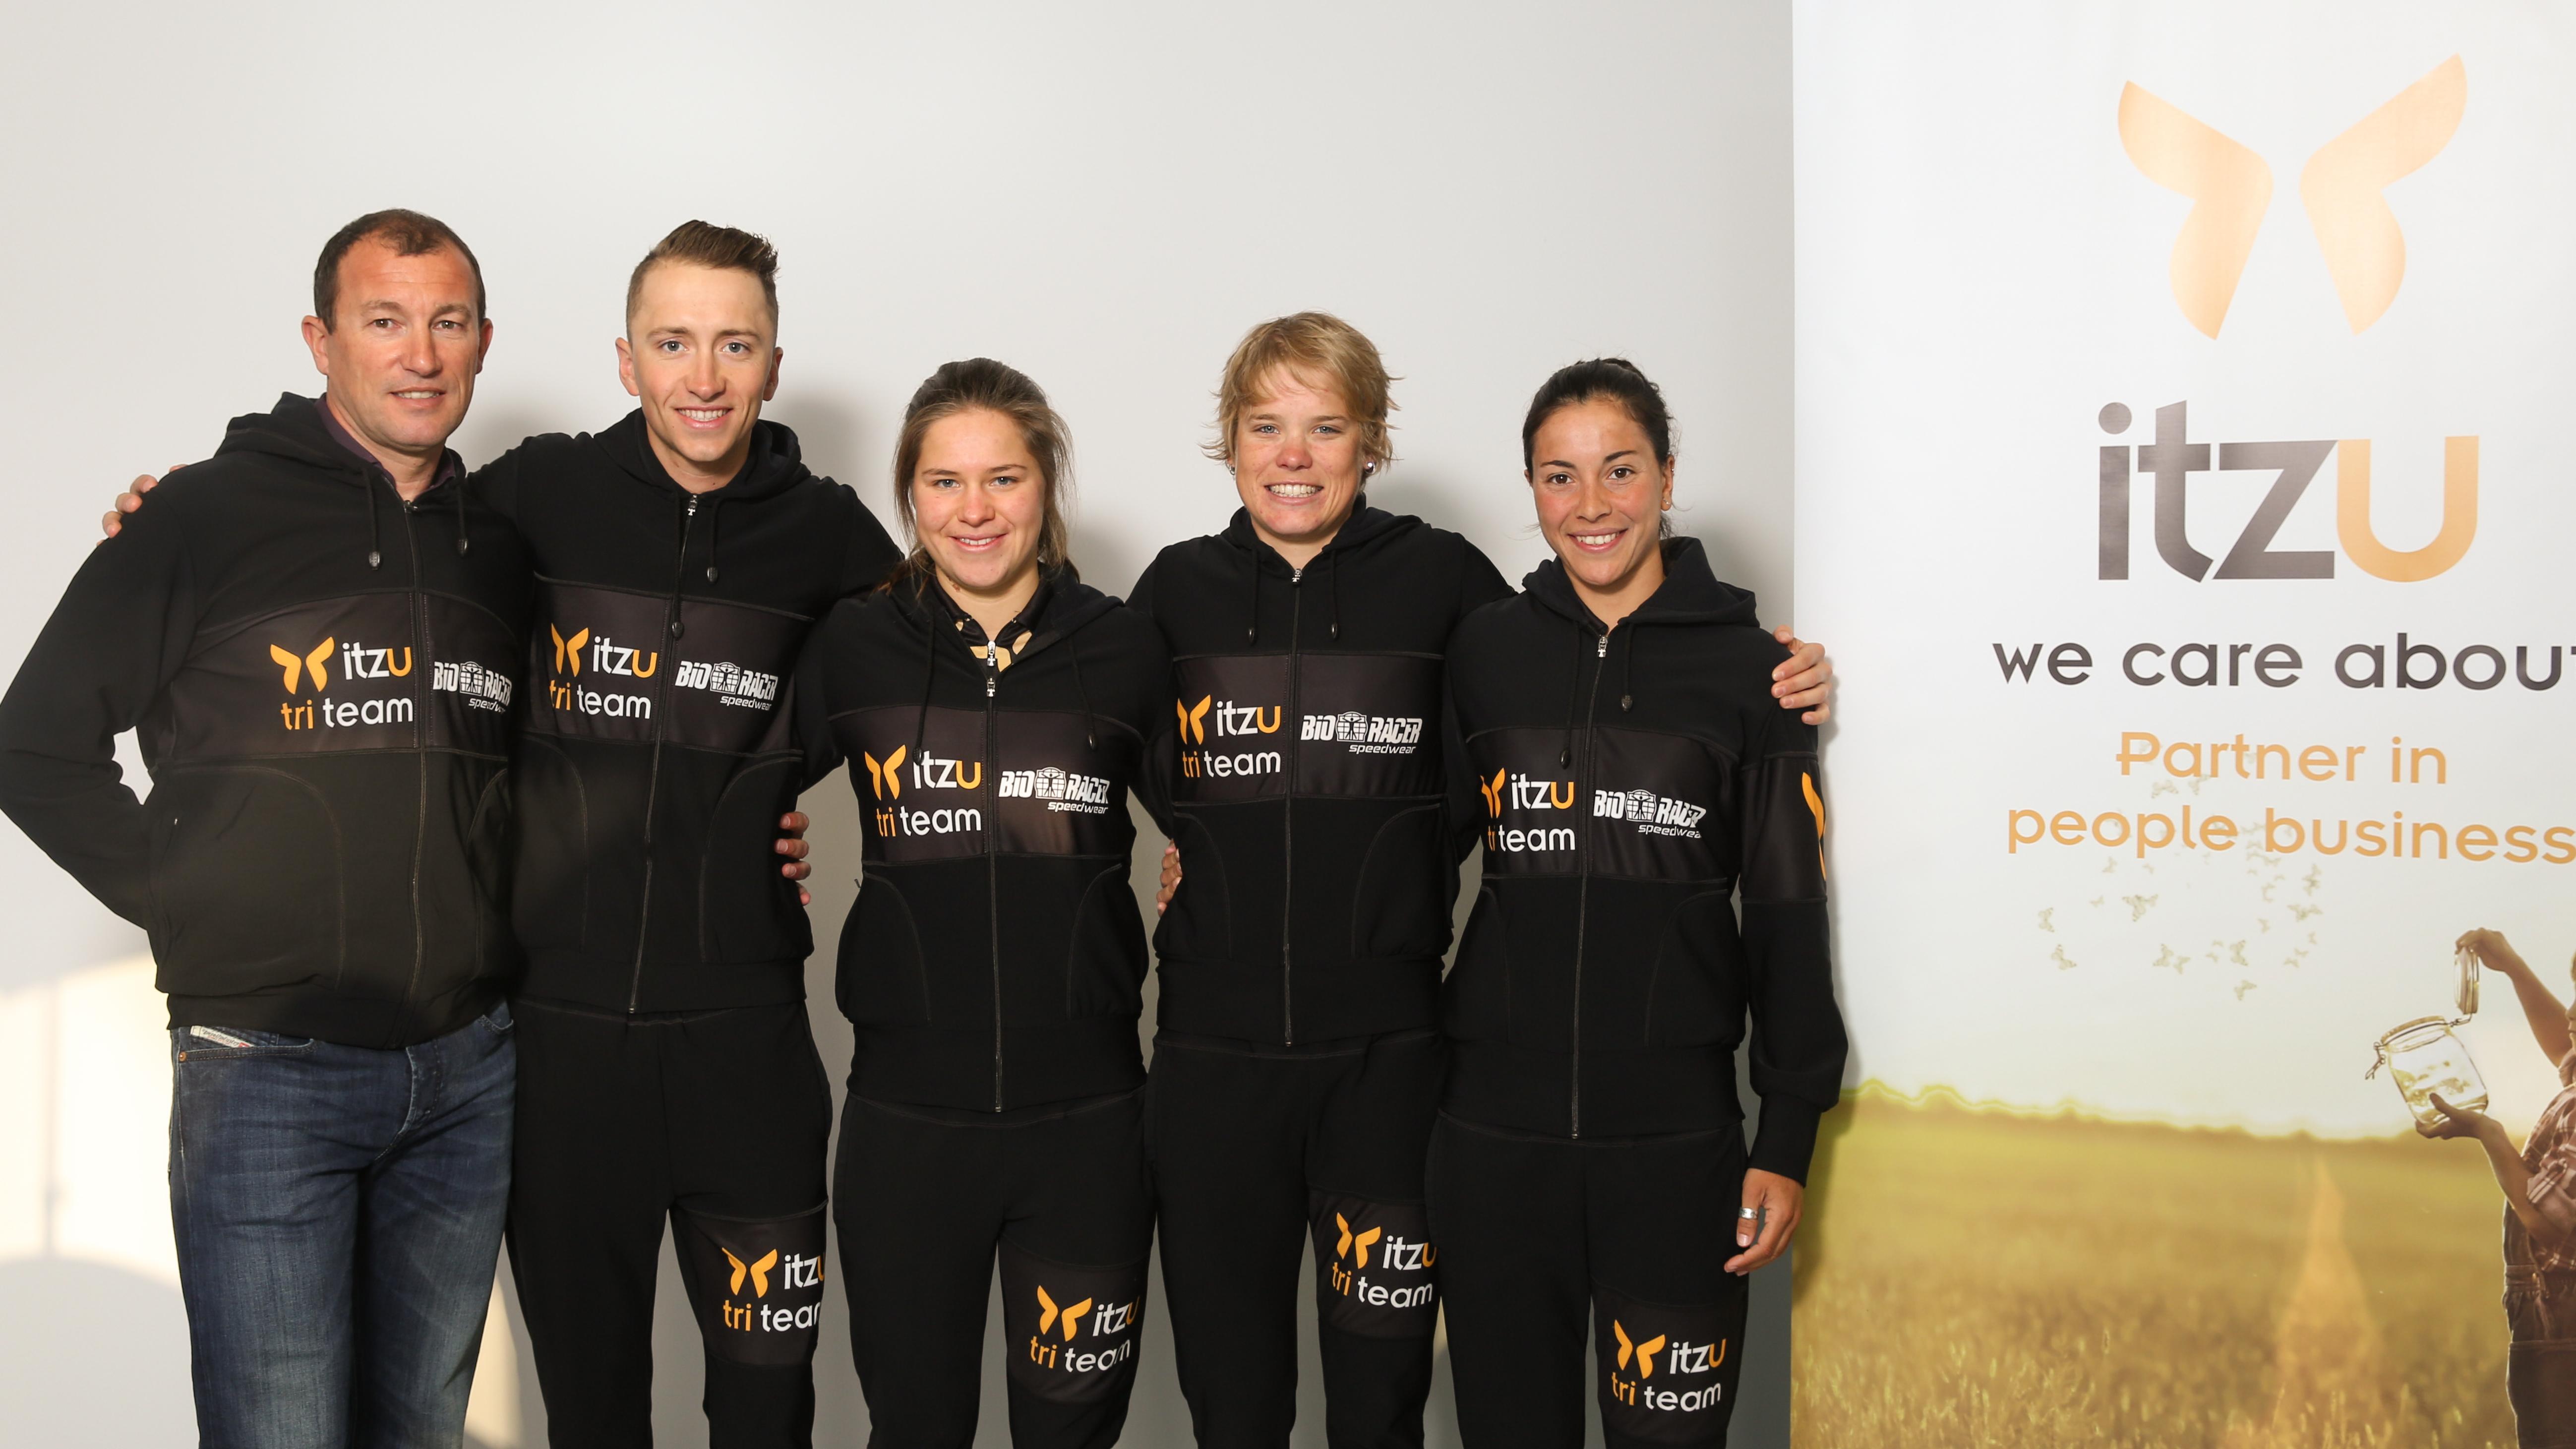 Het Itzu Tri Team, professioneel triatlonteam onder leiding van Luc Van Lierde